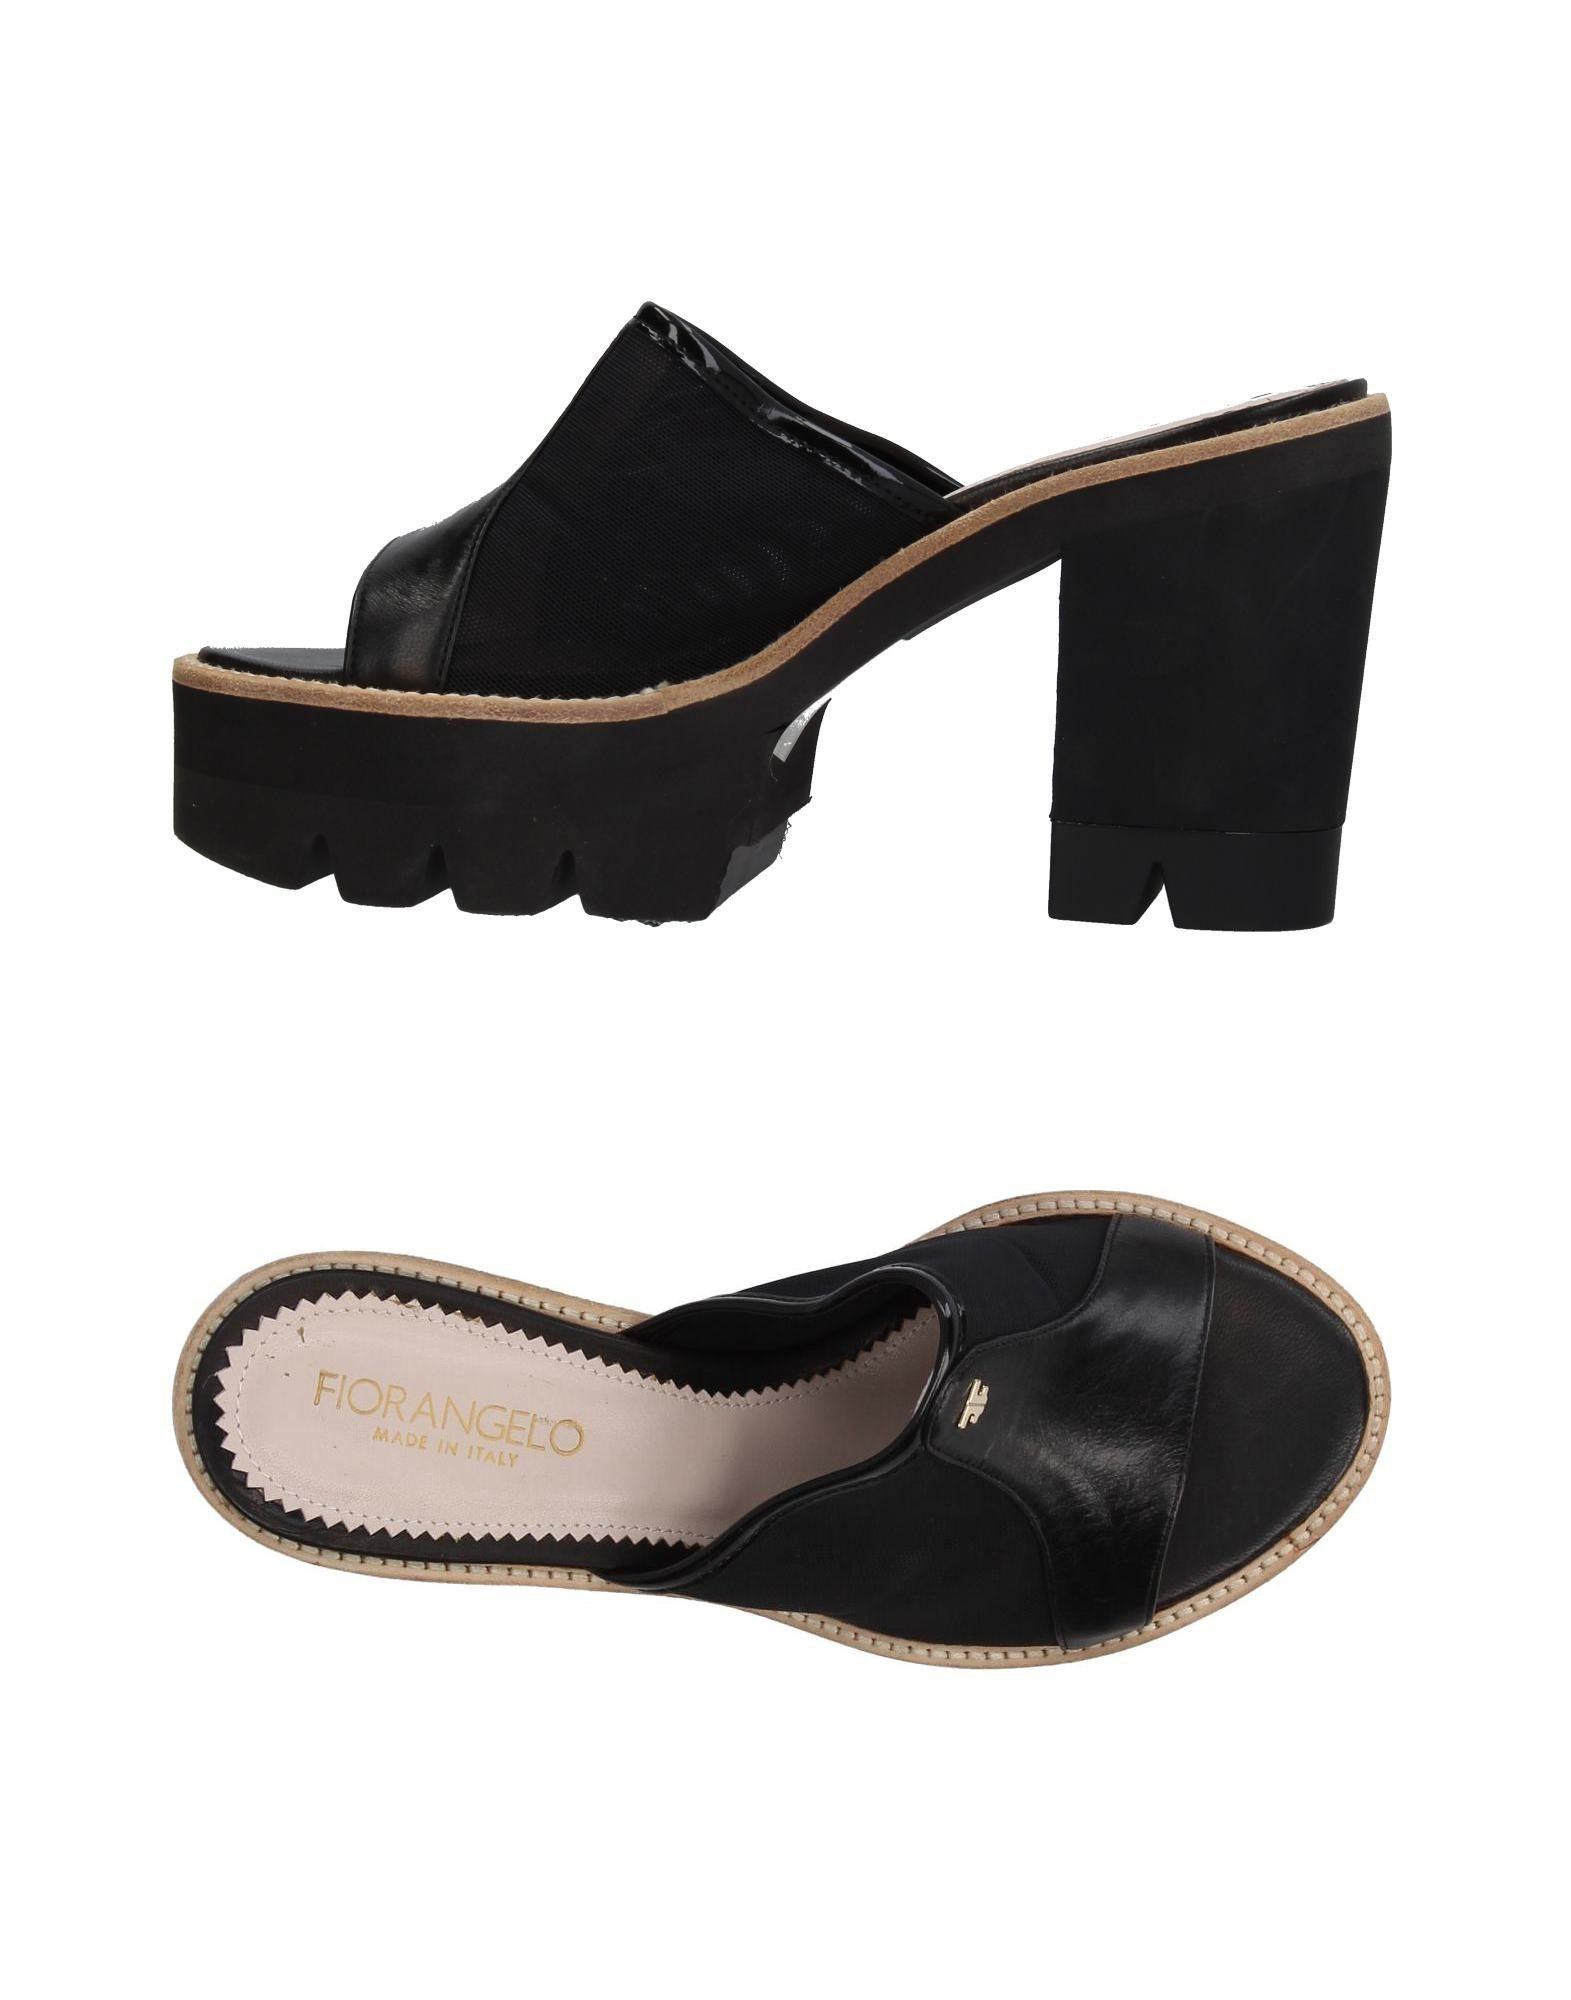 Moda Sandali Fiorangelo Donna - 11378216QN